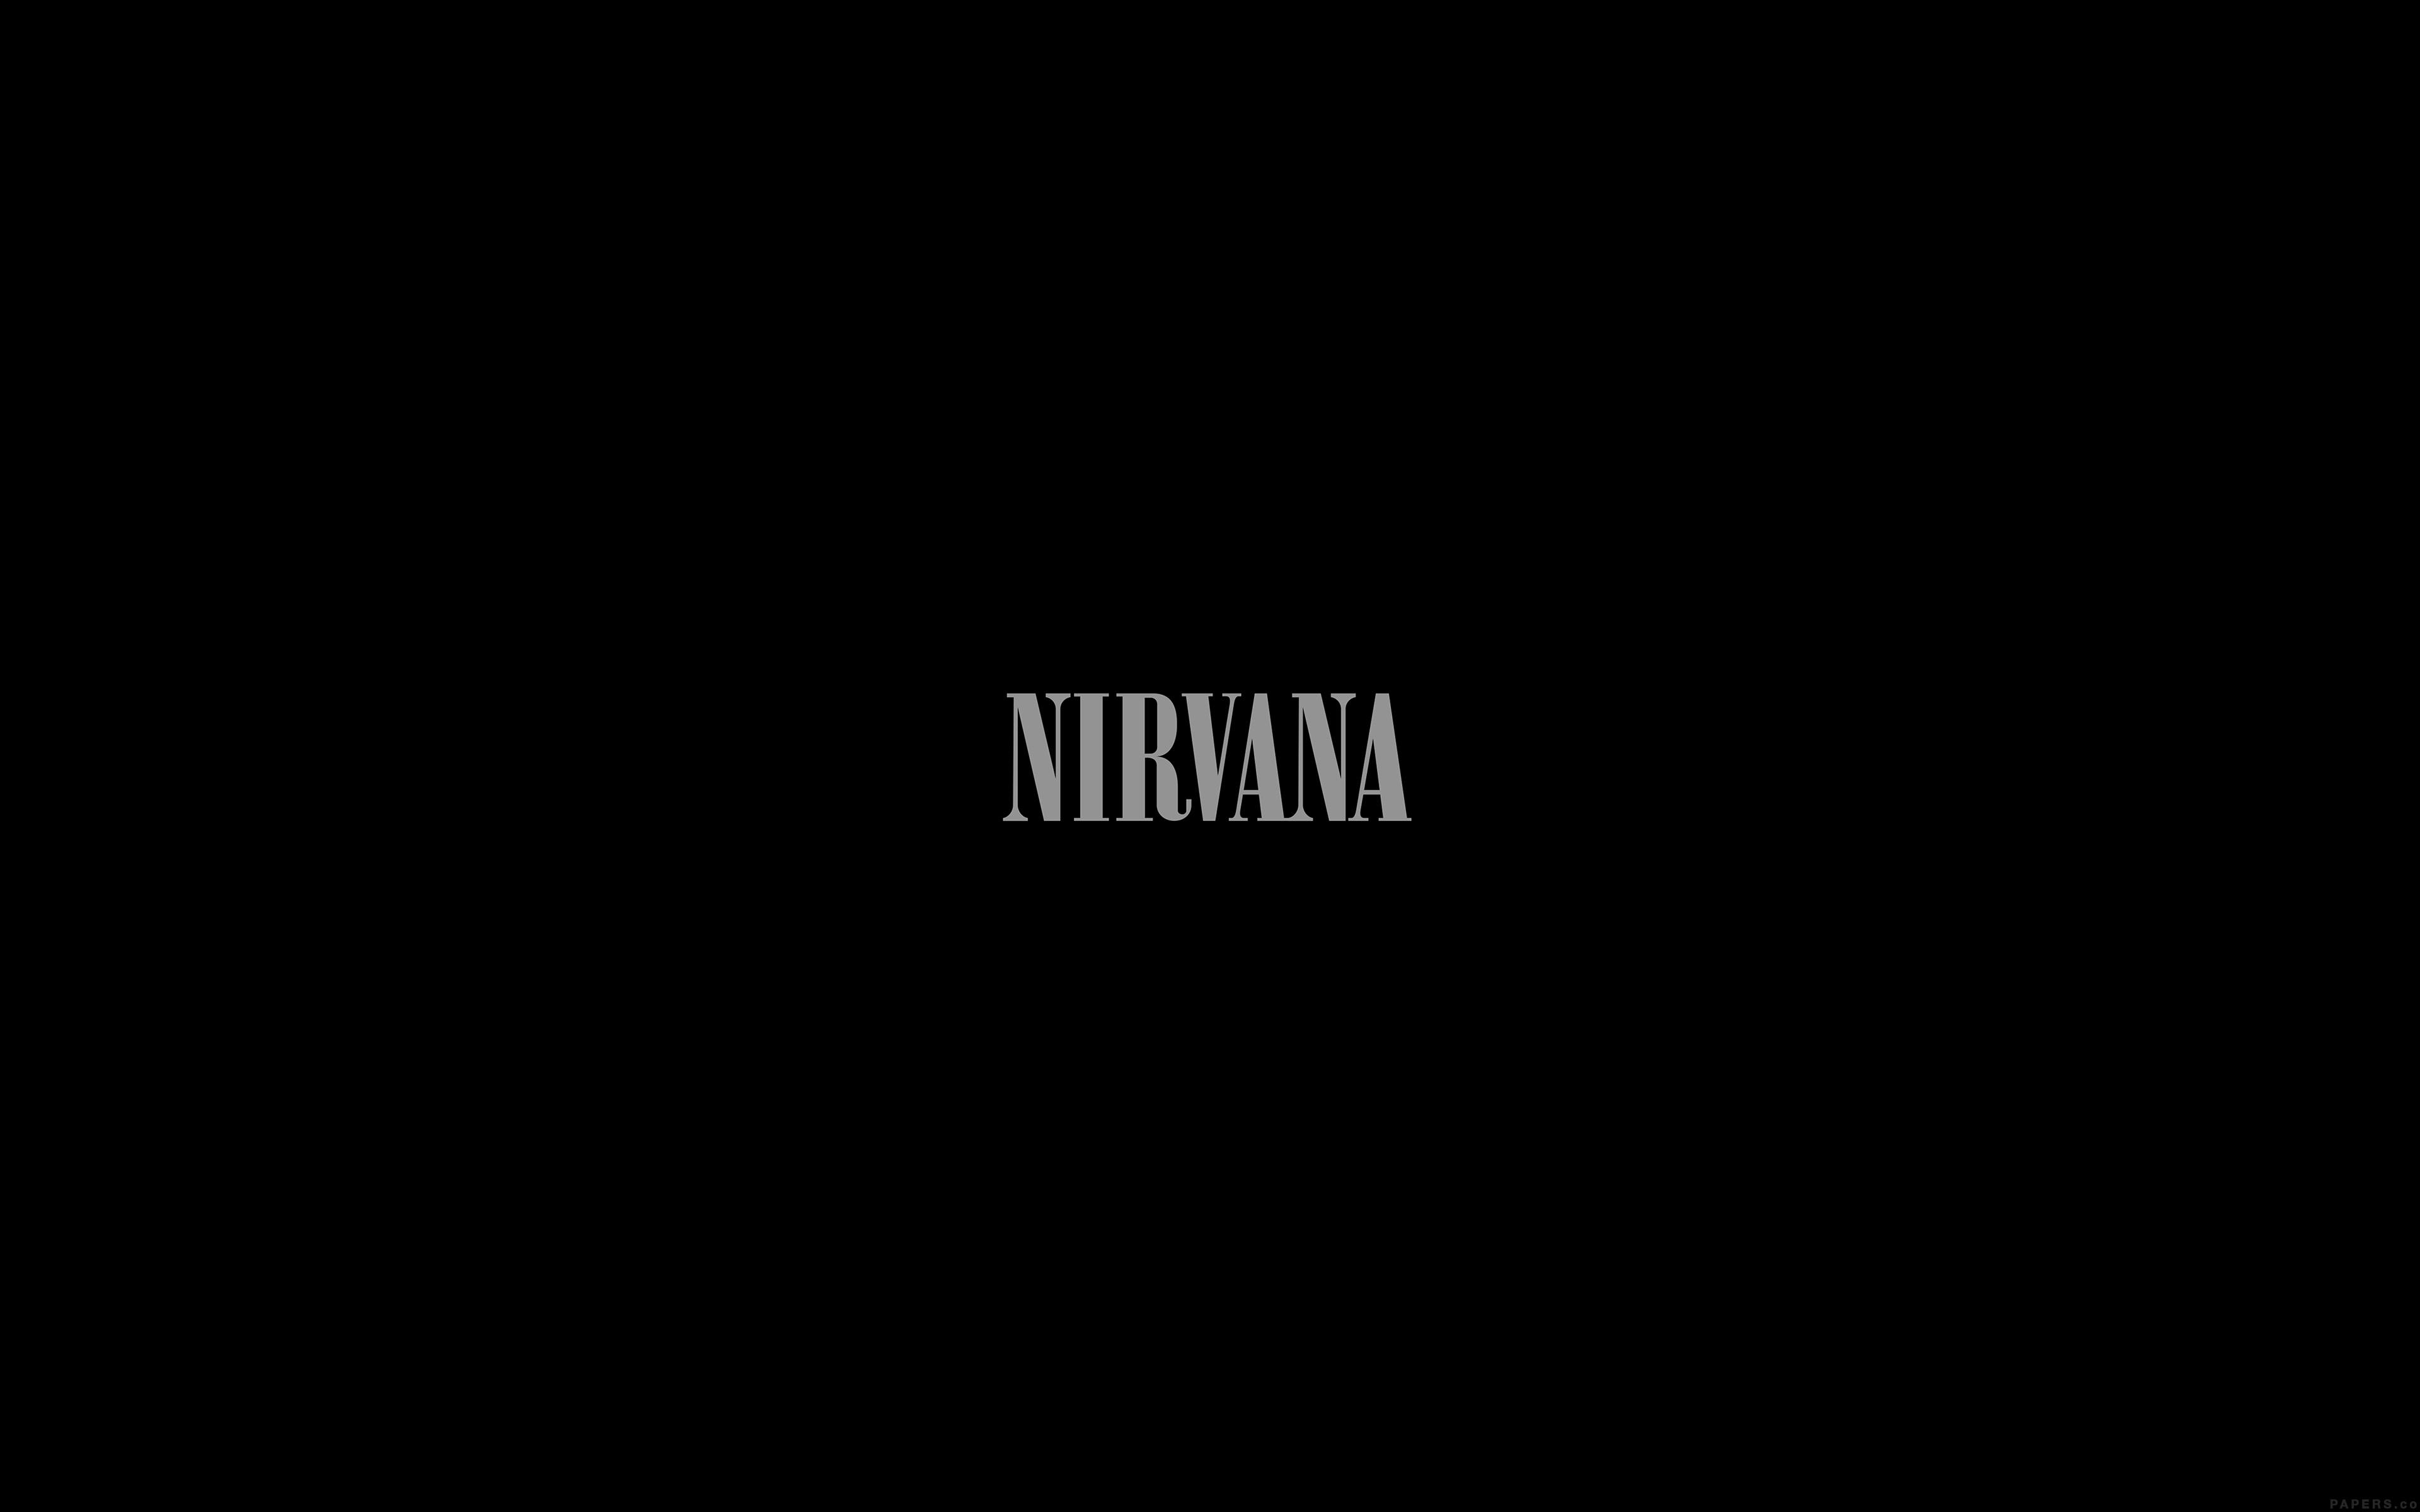 Iphone 5 Wave Wallpaper Ak78 Nirvana Dark Logo Simple Minimal Music Wallpaper